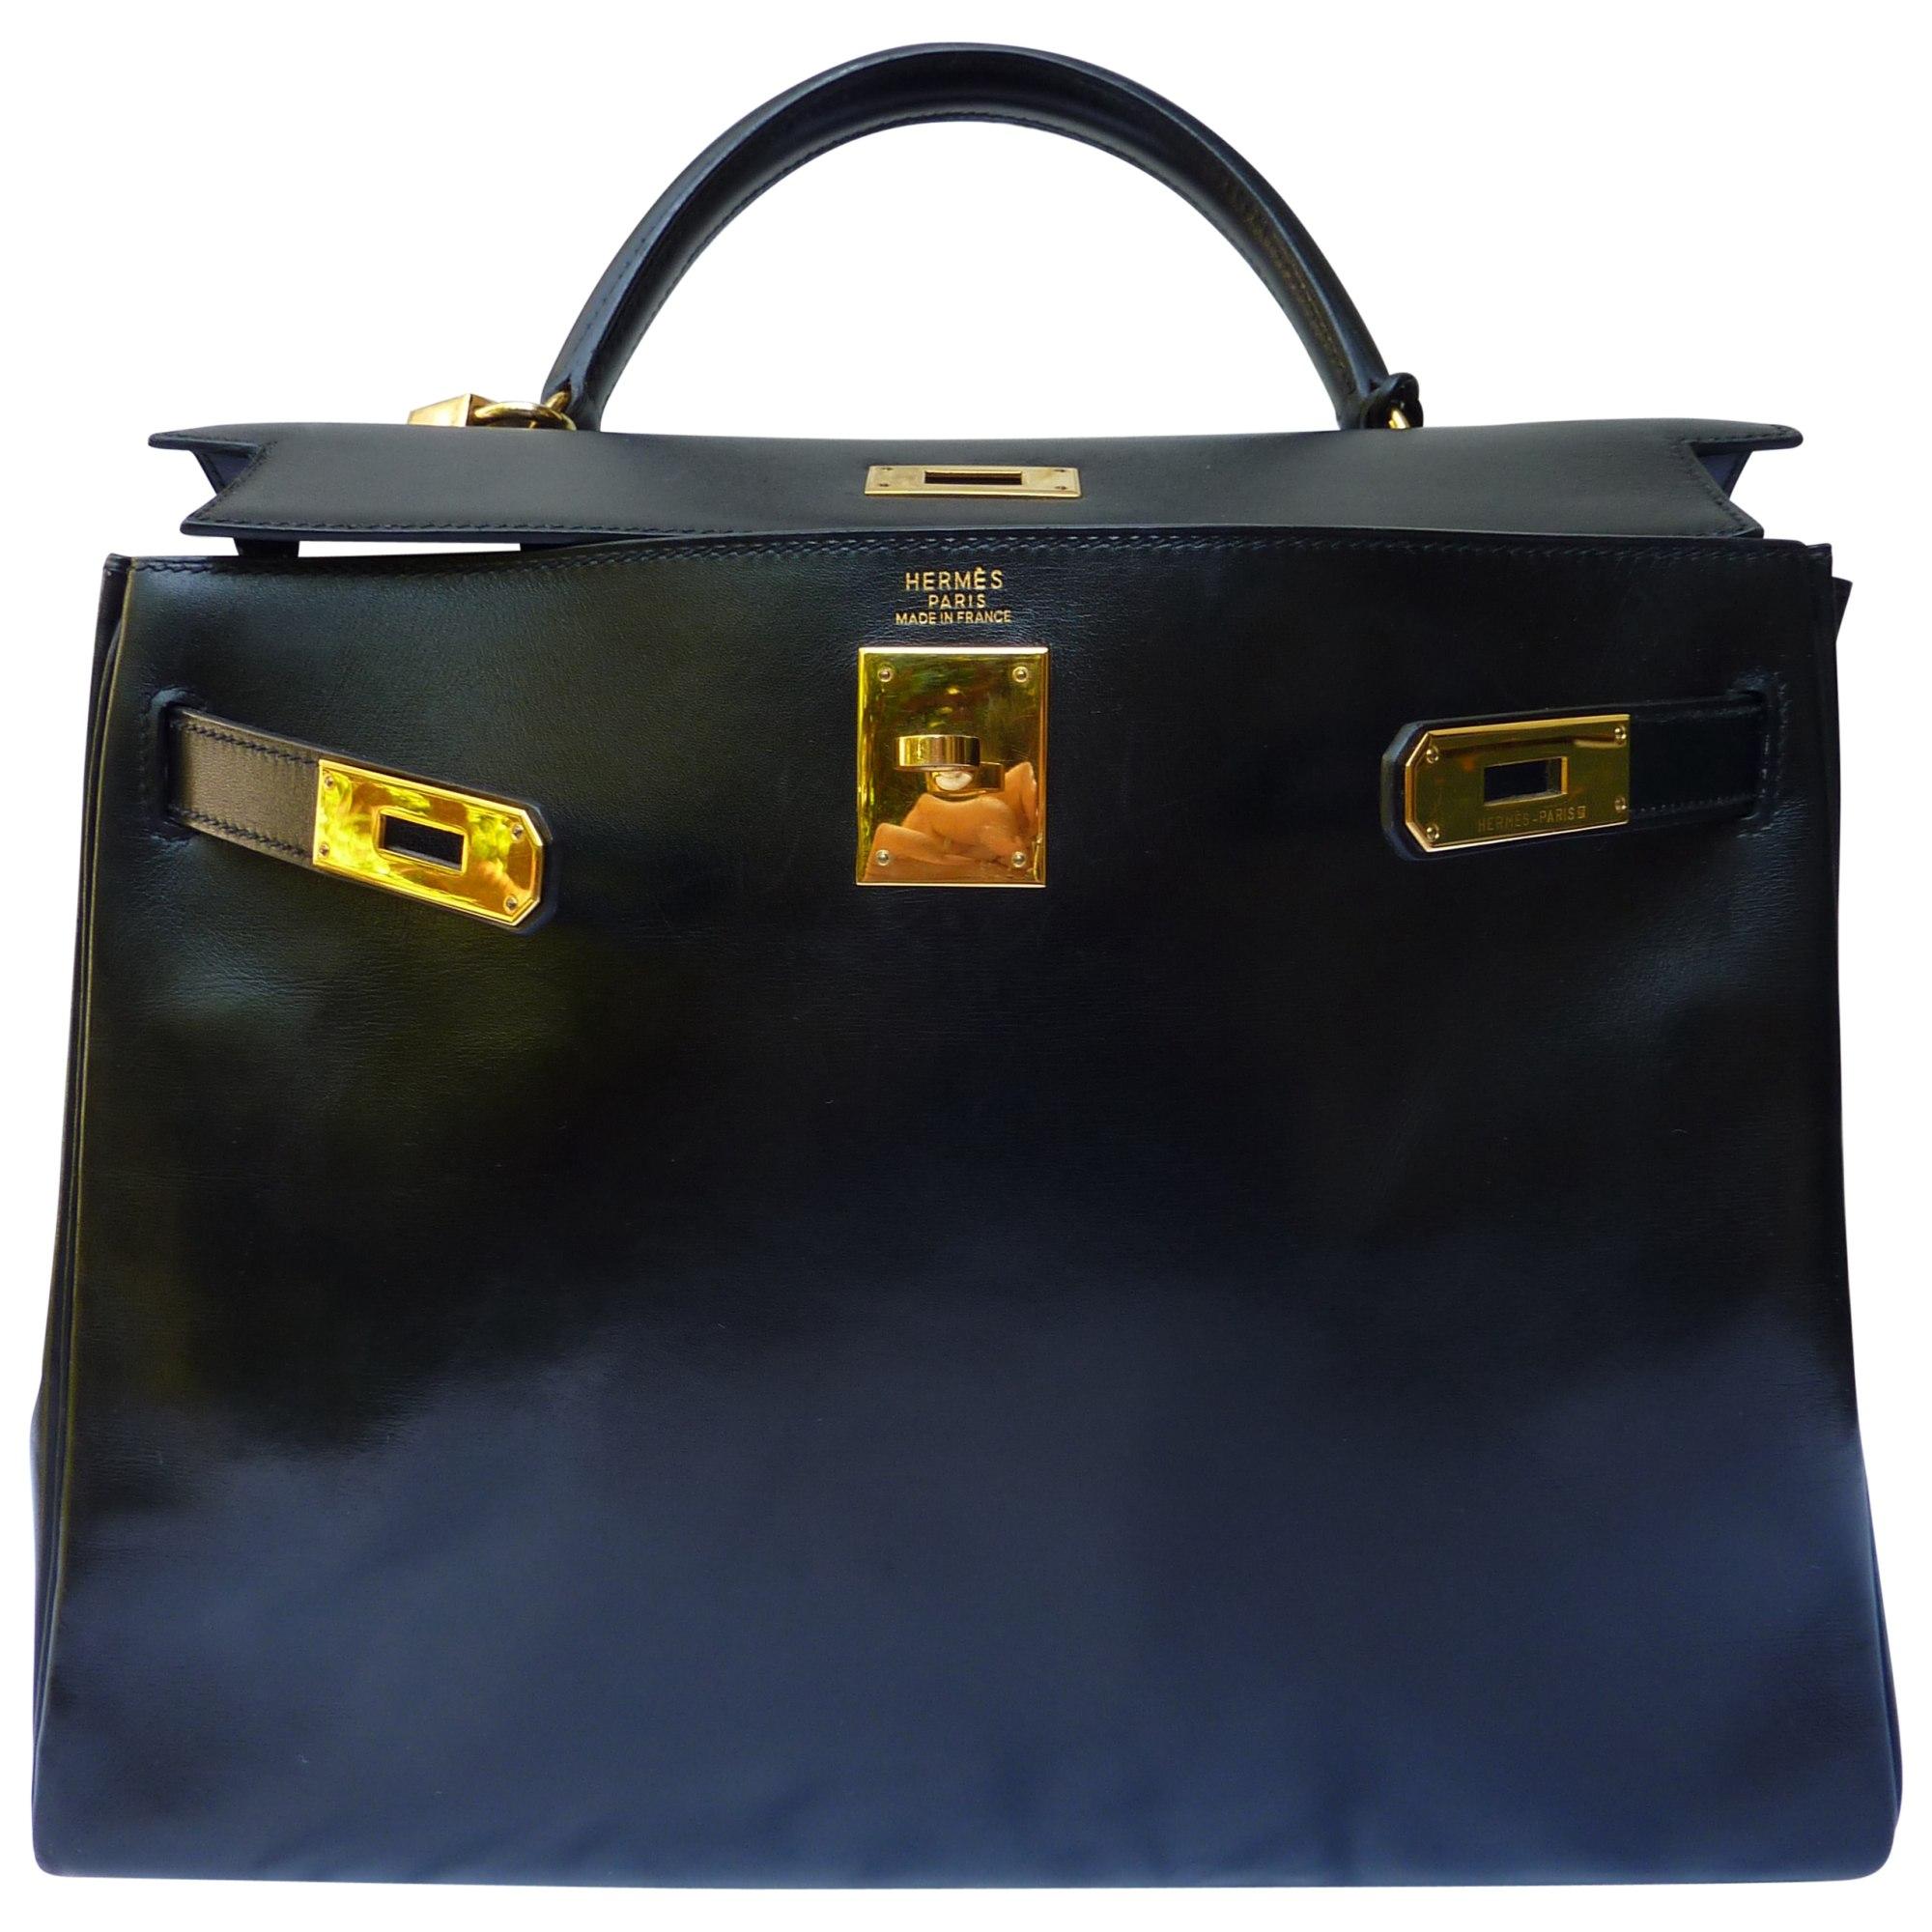 Sac à main en cuir HERMÈS kelly noir vendu par Condensa - 3596654 e53820ee71f